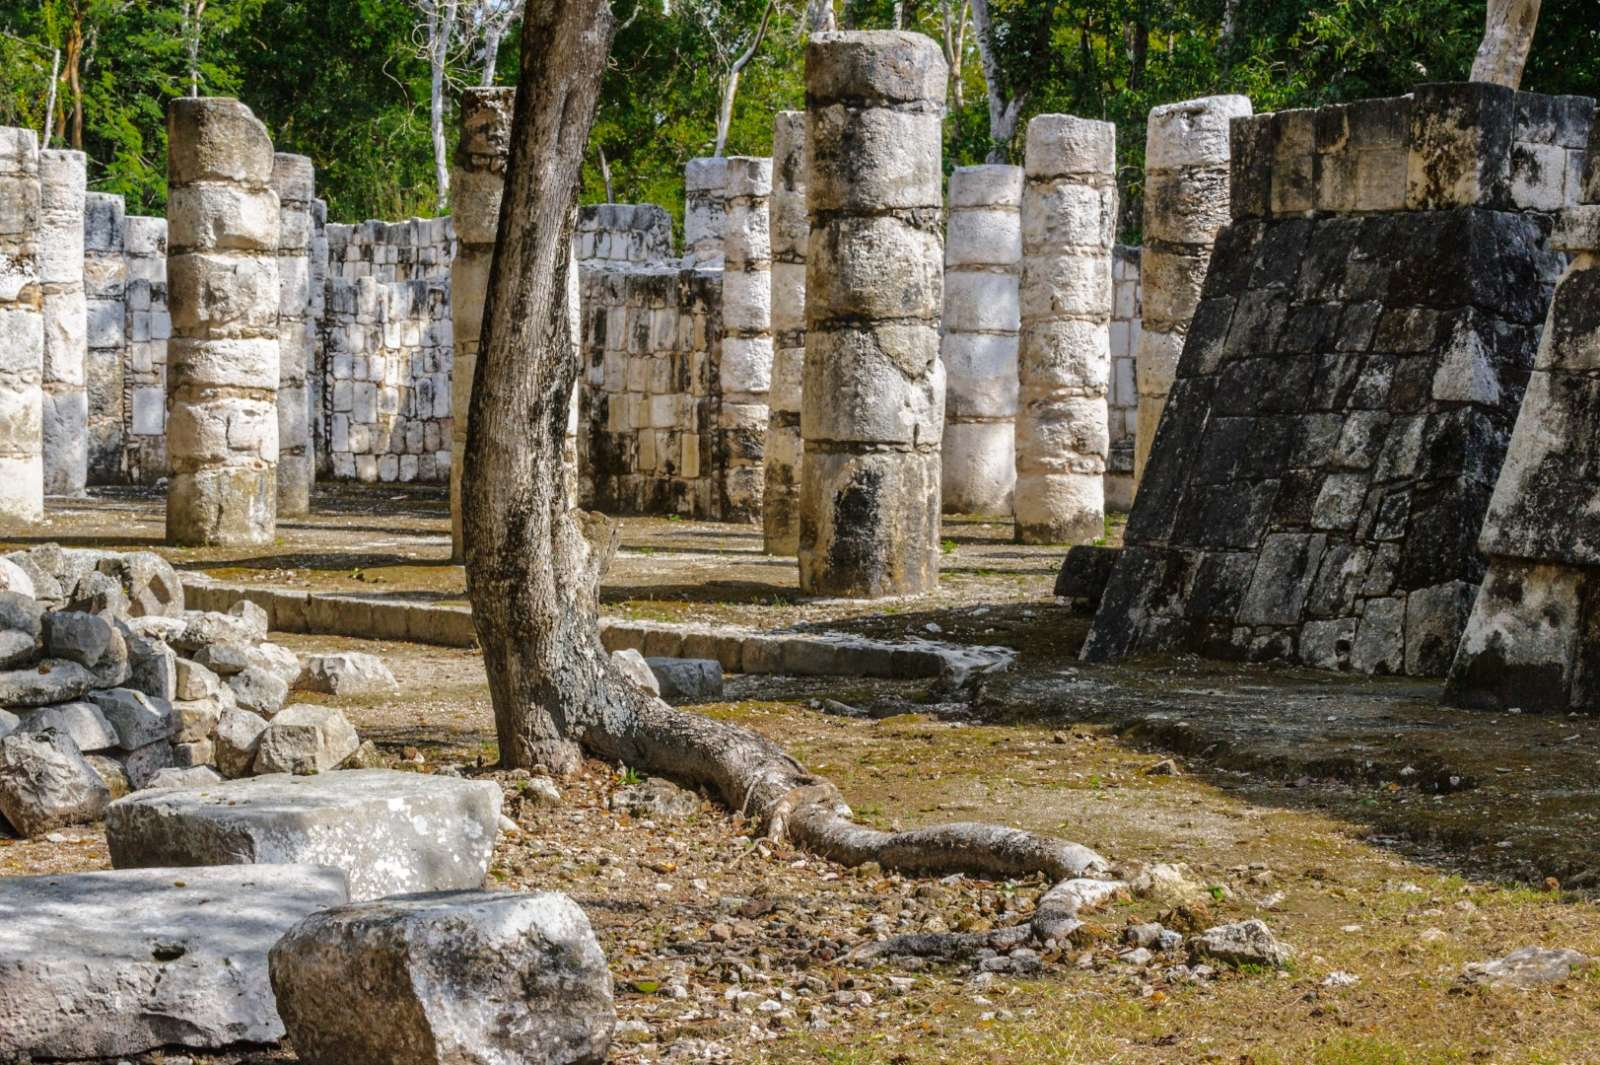 Columns and tree at Chichen Itza